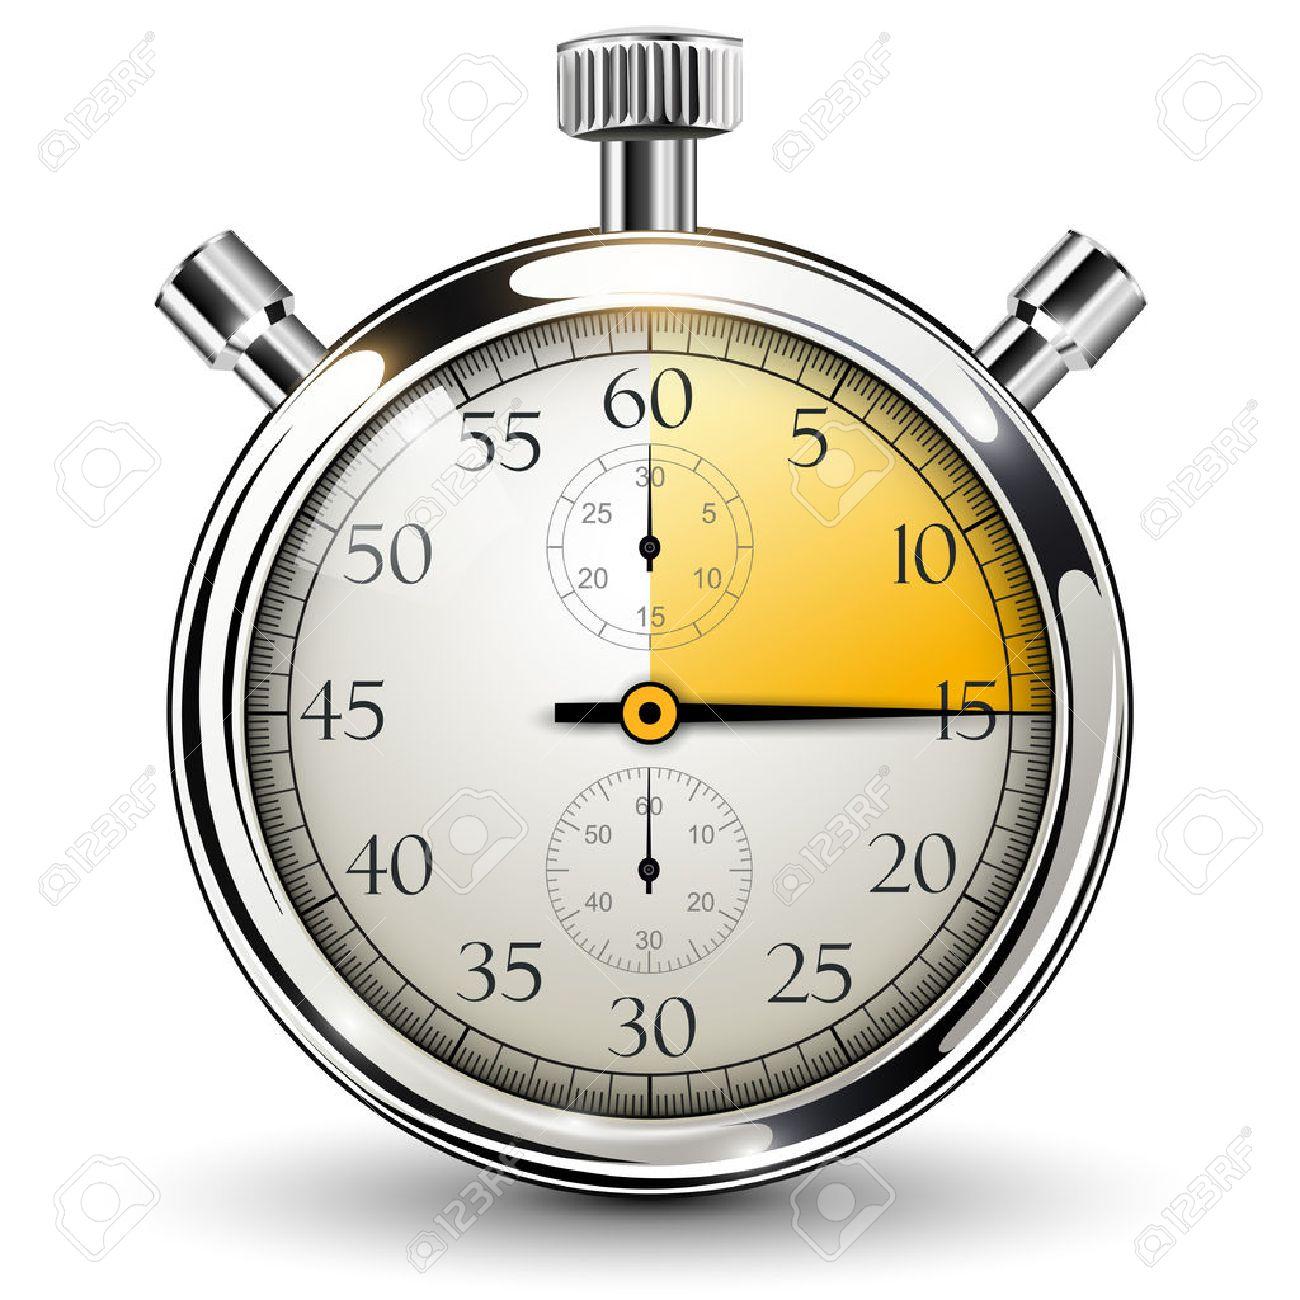 1o minutes timer